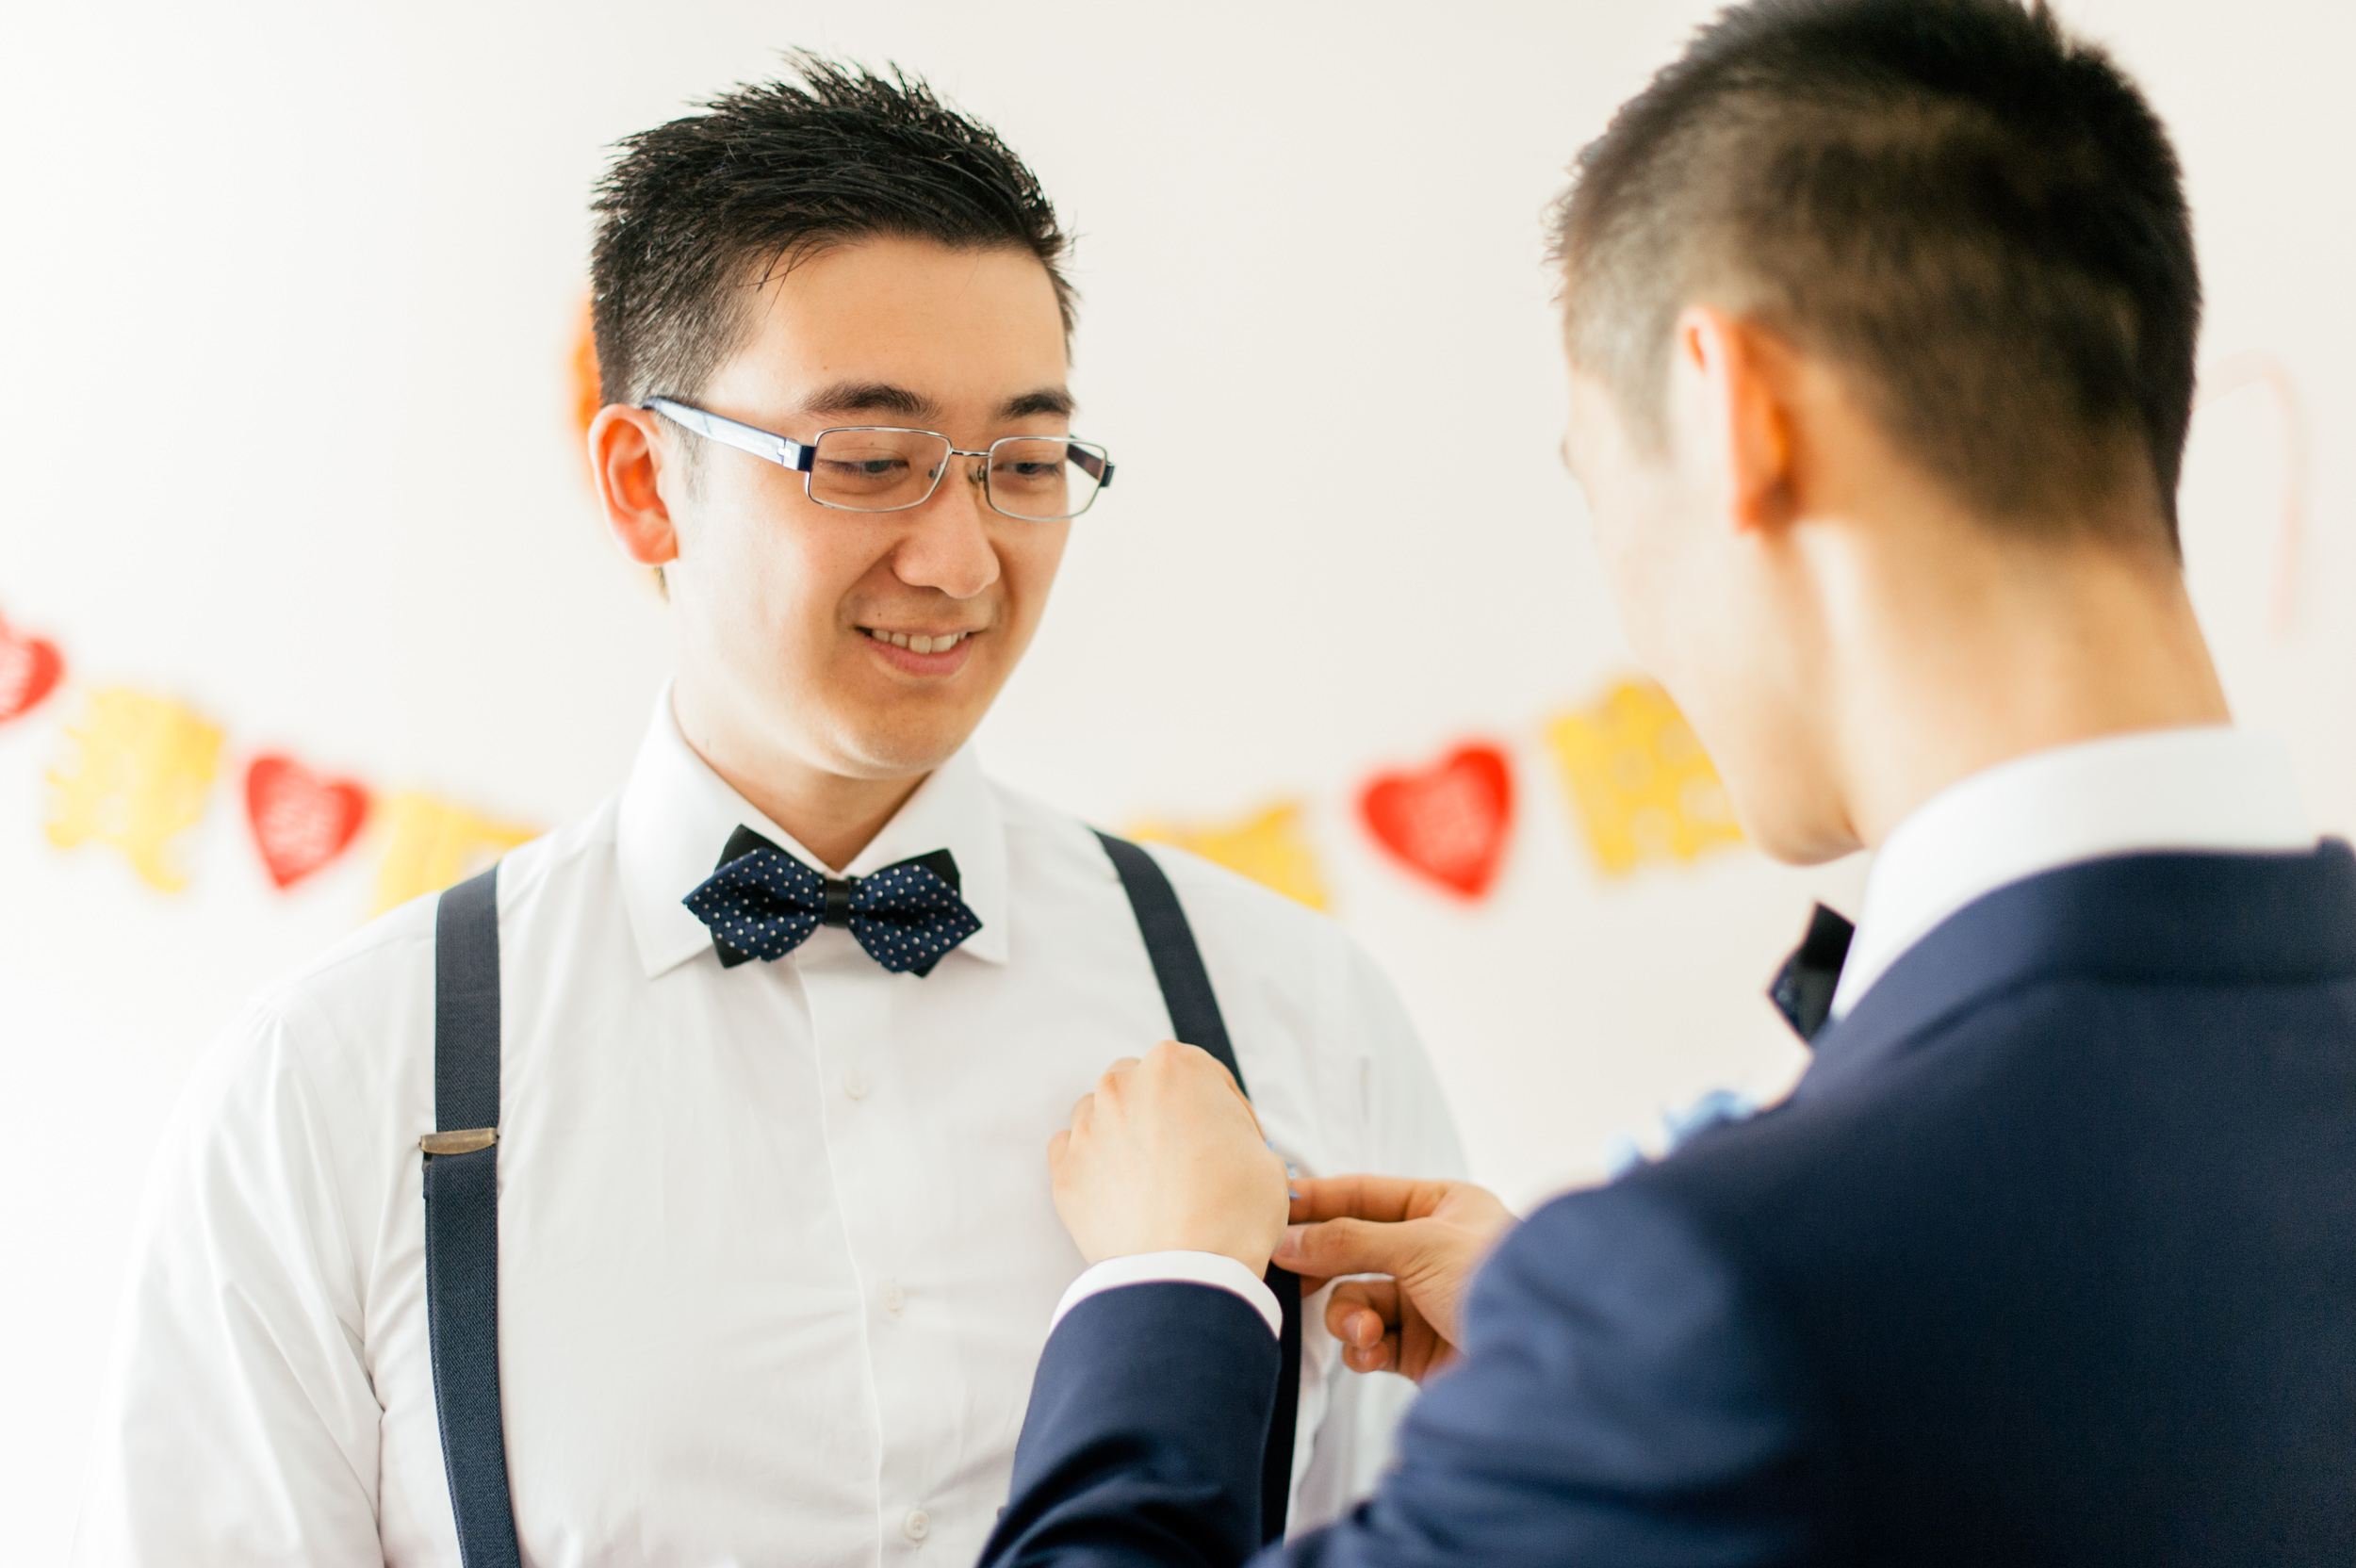 knox-college-wedding-30.jpg